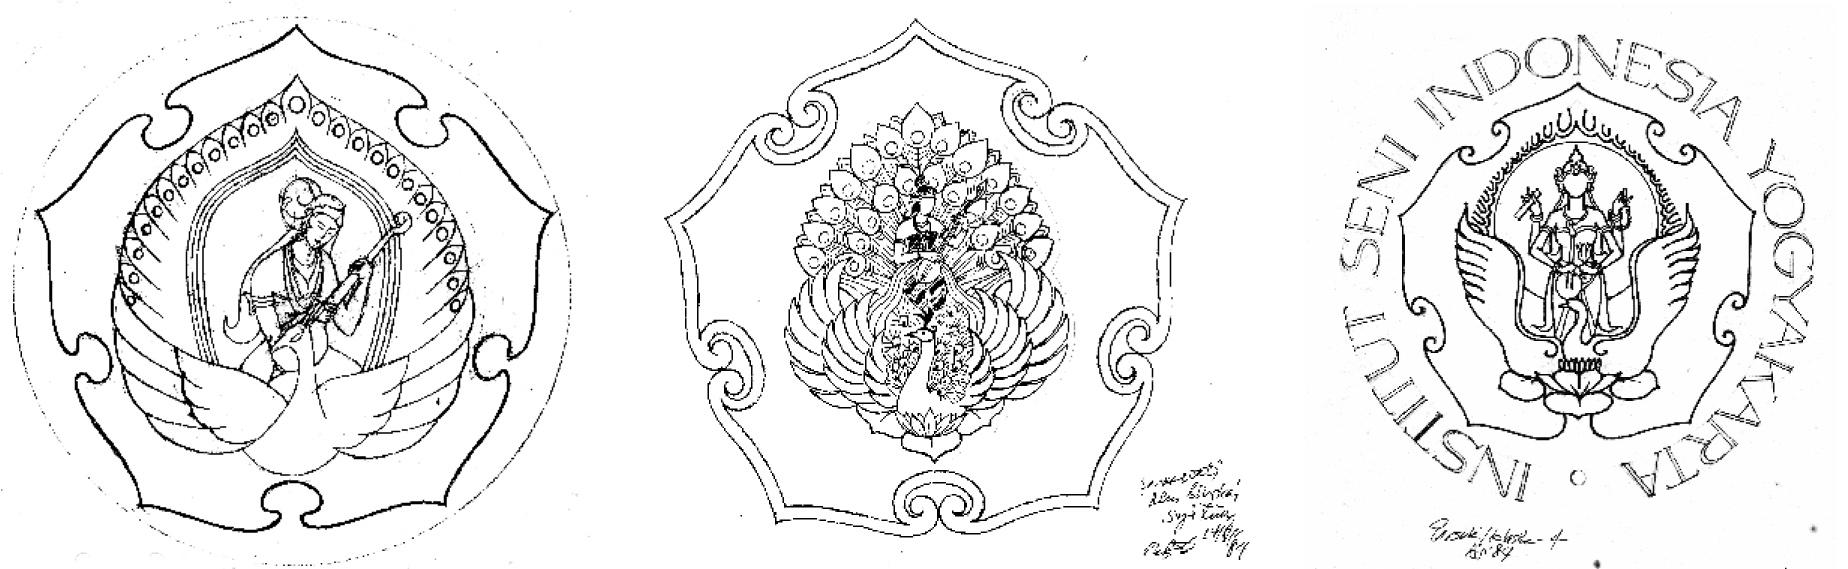 Tiga rancangan awal lambang ISI Yogyakarta, bergaya klasik karya Drs. Aming Prayitno, Drs. Subroto Sm dan Drs. Parsuki  (dok: Subroto, Sm.)